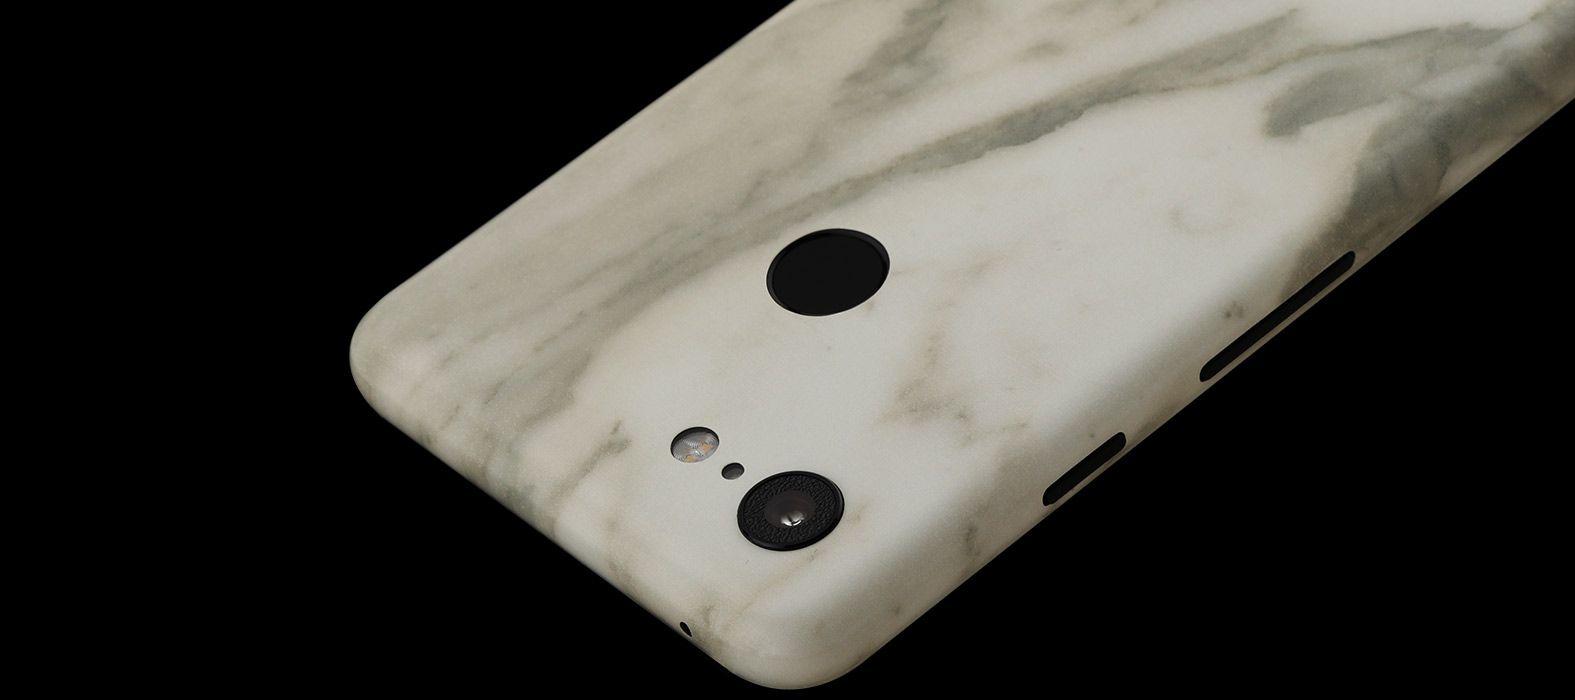 Pixel 3 XL White Marble Skins